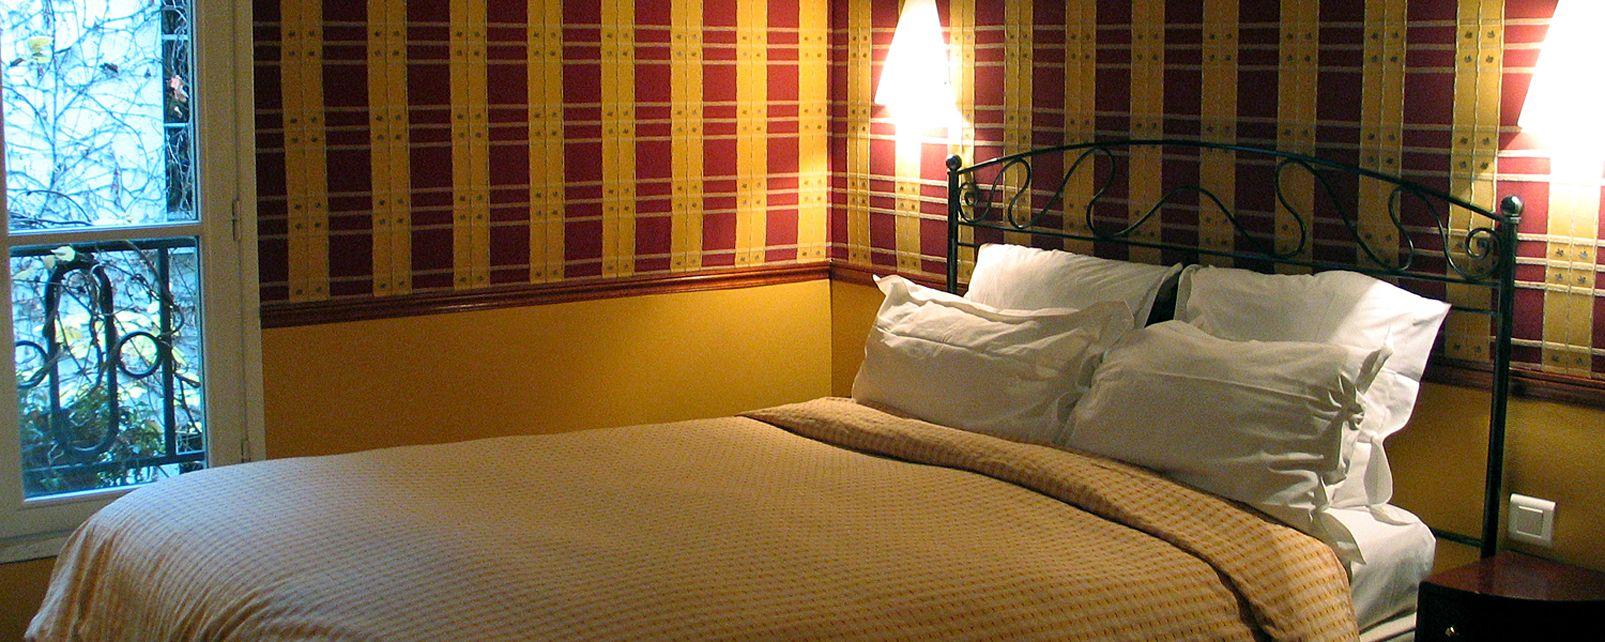 Hotel Relais St Sulpice